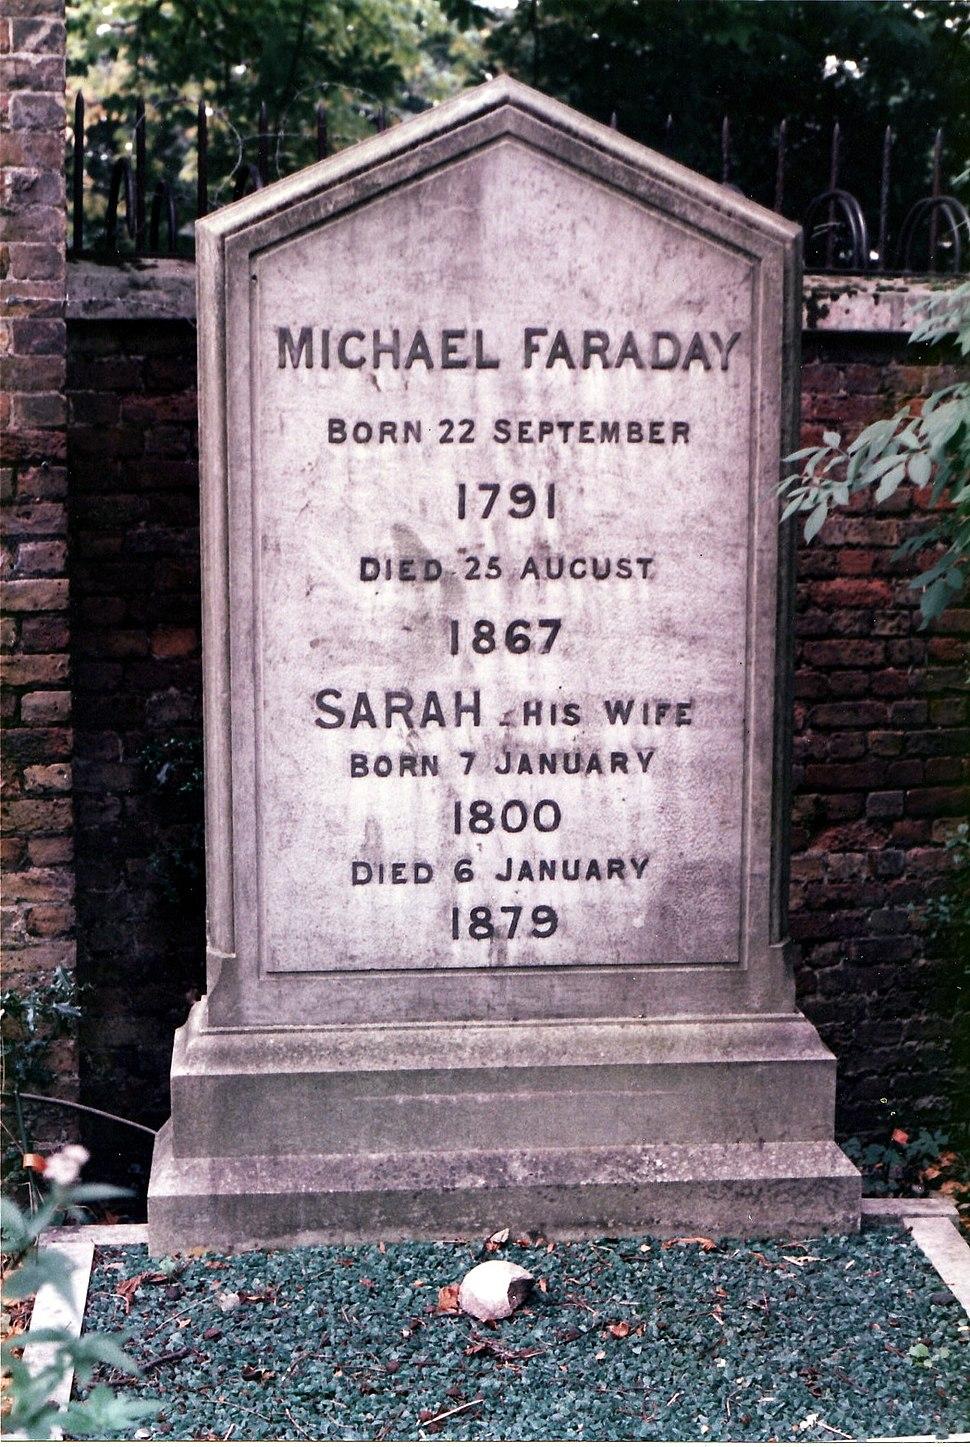 Faraday Michael grave